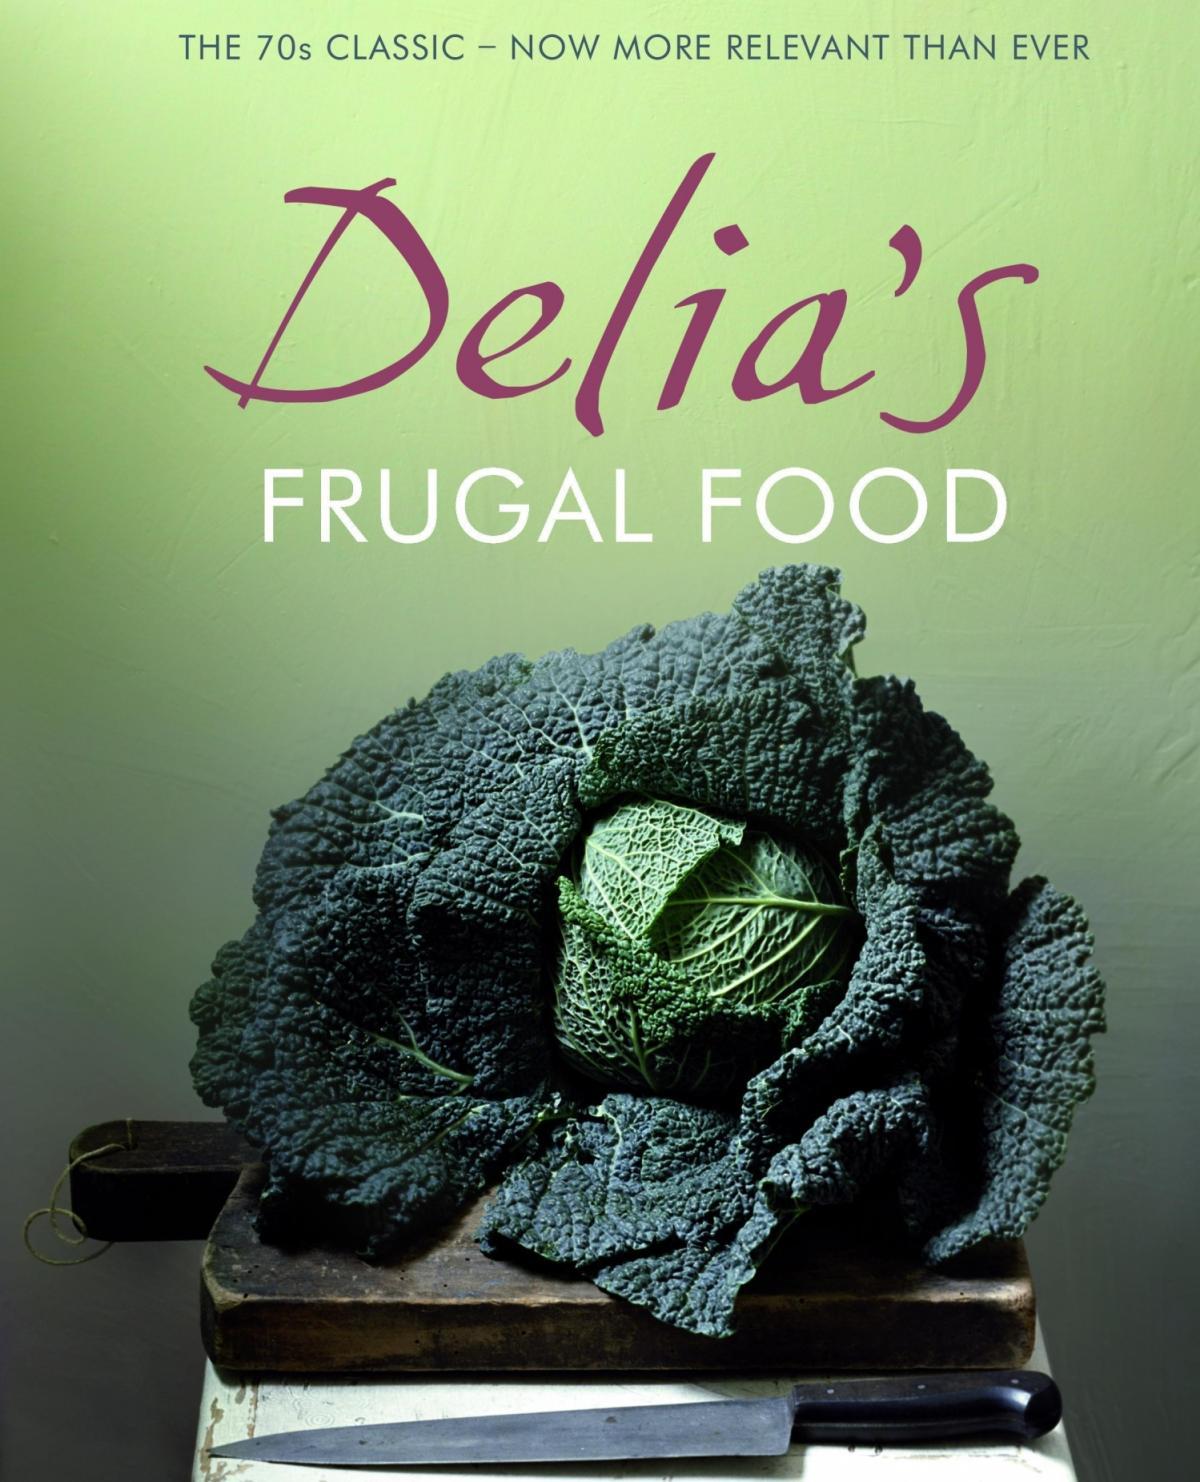 A picture of Delia's Delia's Frugal Food recipes